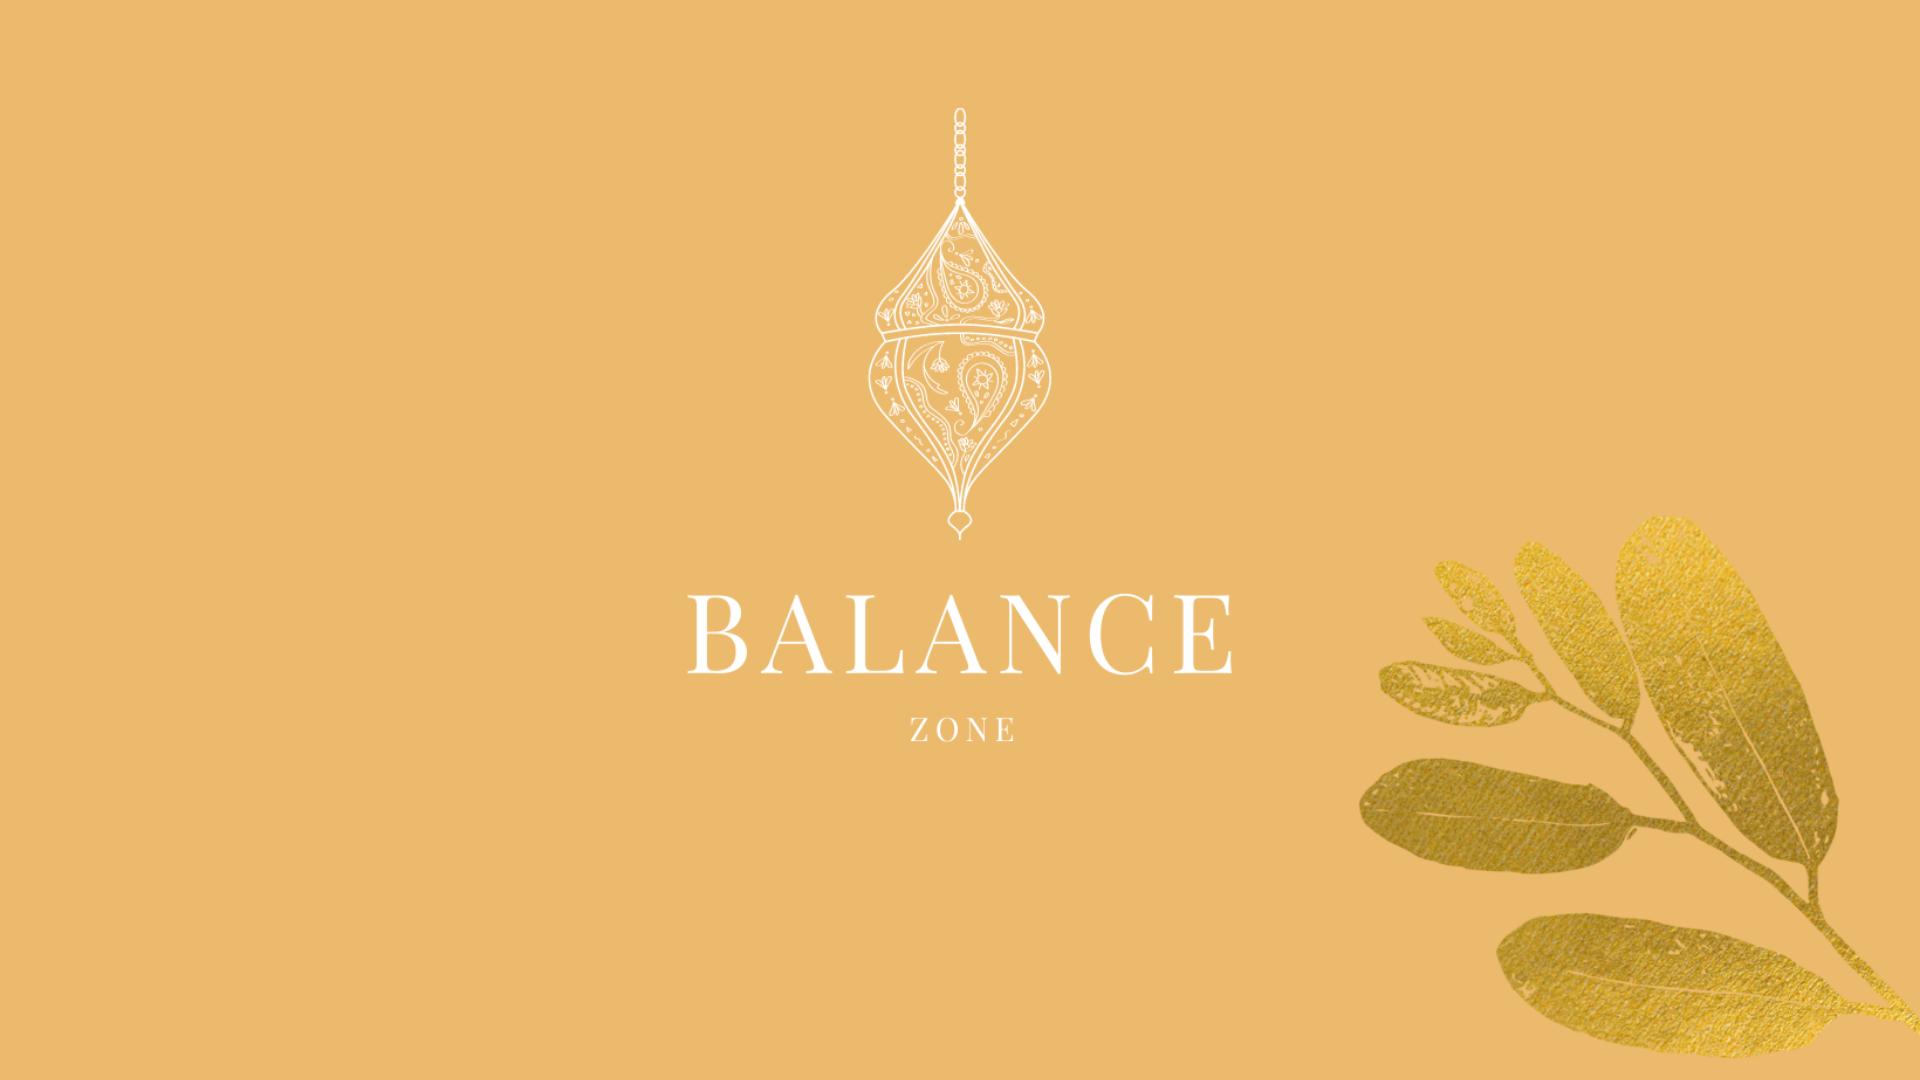 Balance Zone - Energy Club